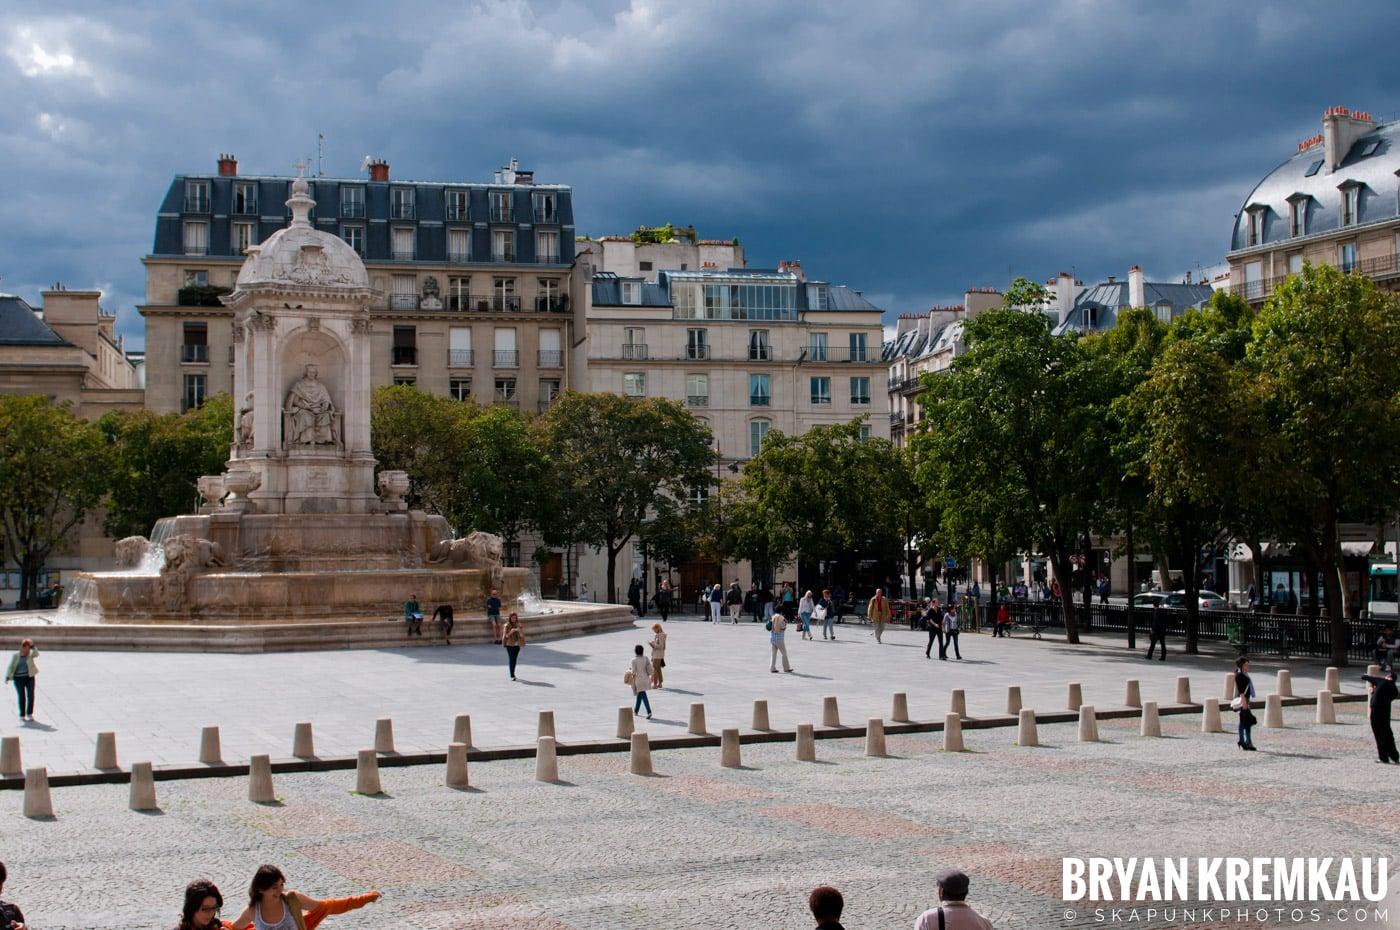 Paris, France Honeymoon - Day 1 - 7.18.11 (15)